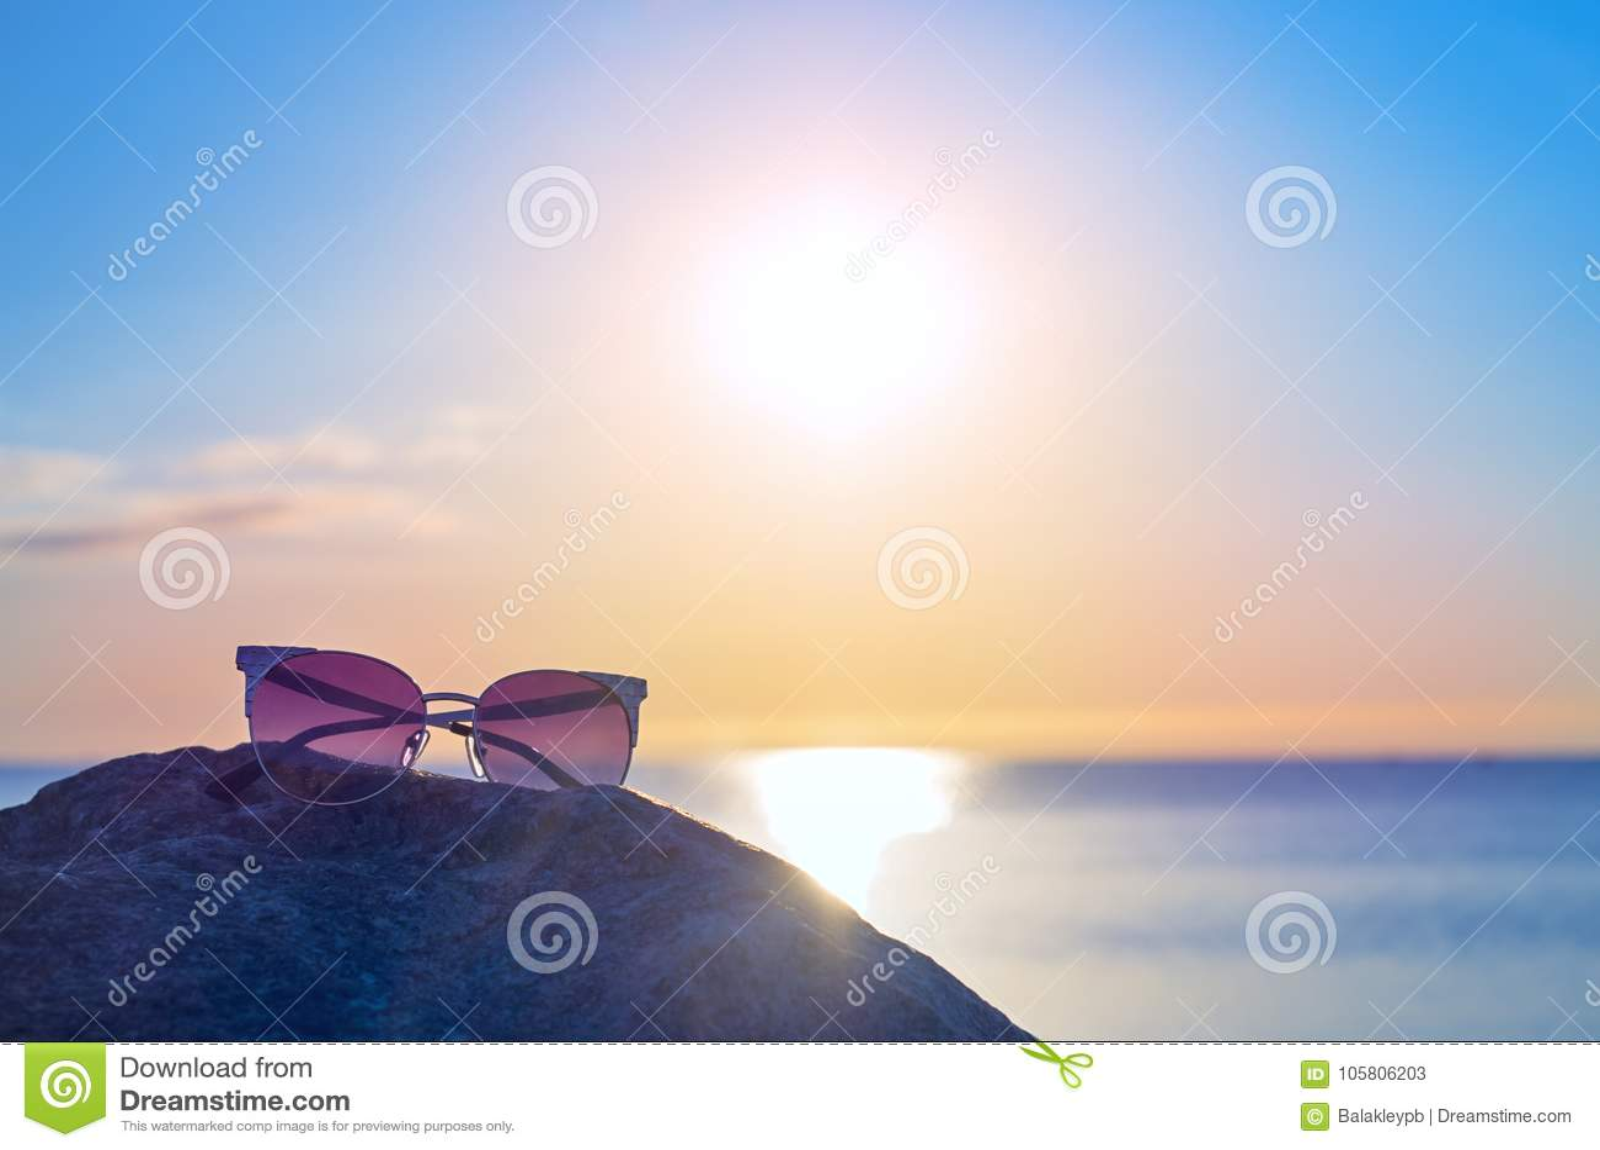 b7dbc67b00 Download Γυαλιά ηλίου σε μια πέτρα κοντά στην ακροθαλασσιά ορίζοντας μπλε  ουρανού ανατολής Στοκ Εικόνα -